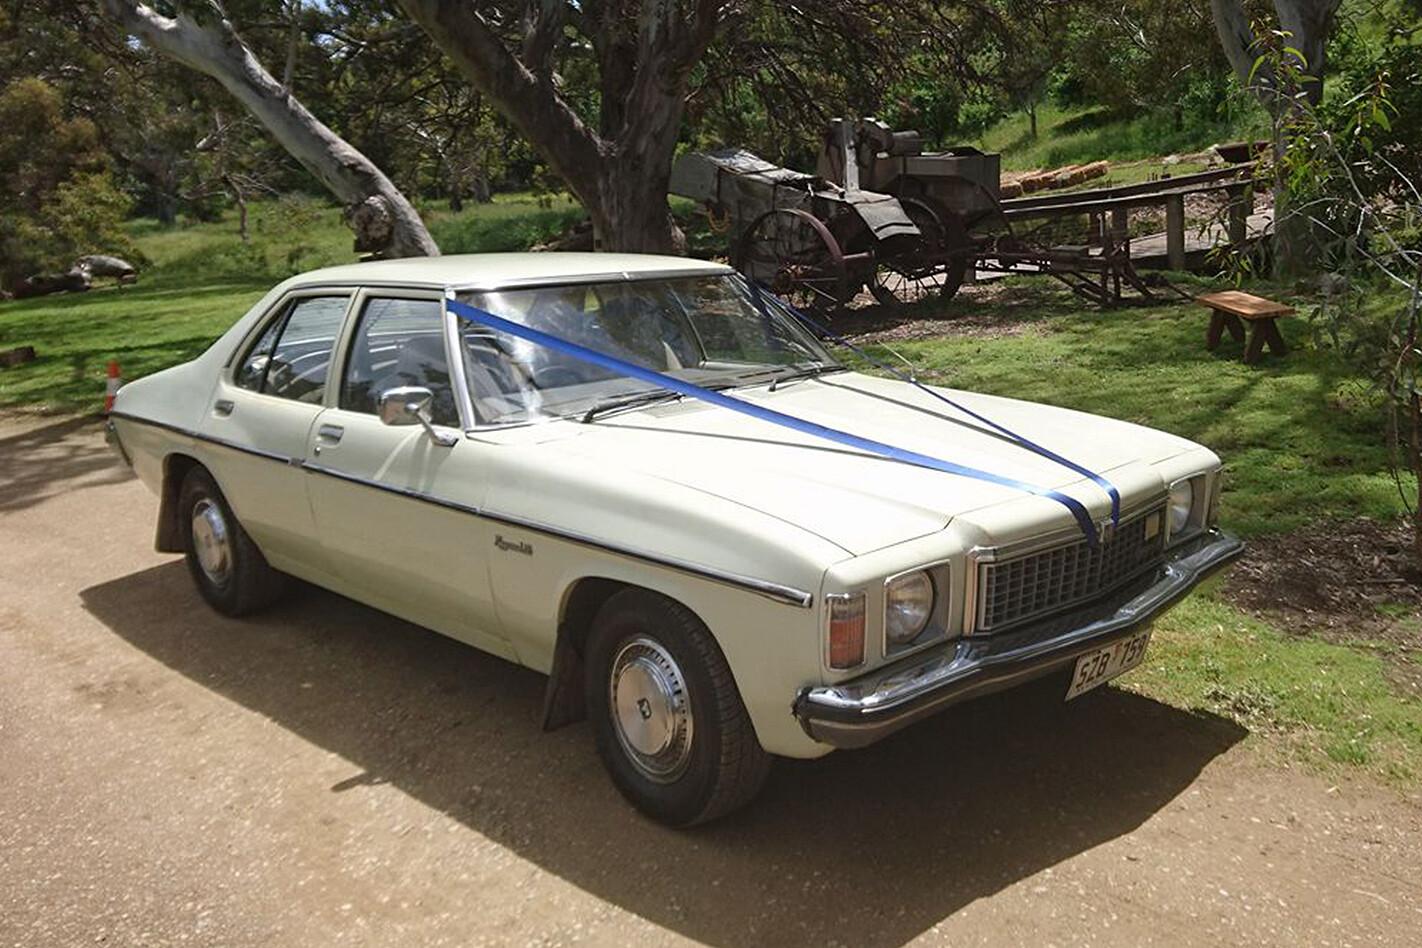 Paul Smith's Holden Kingswood wedding car